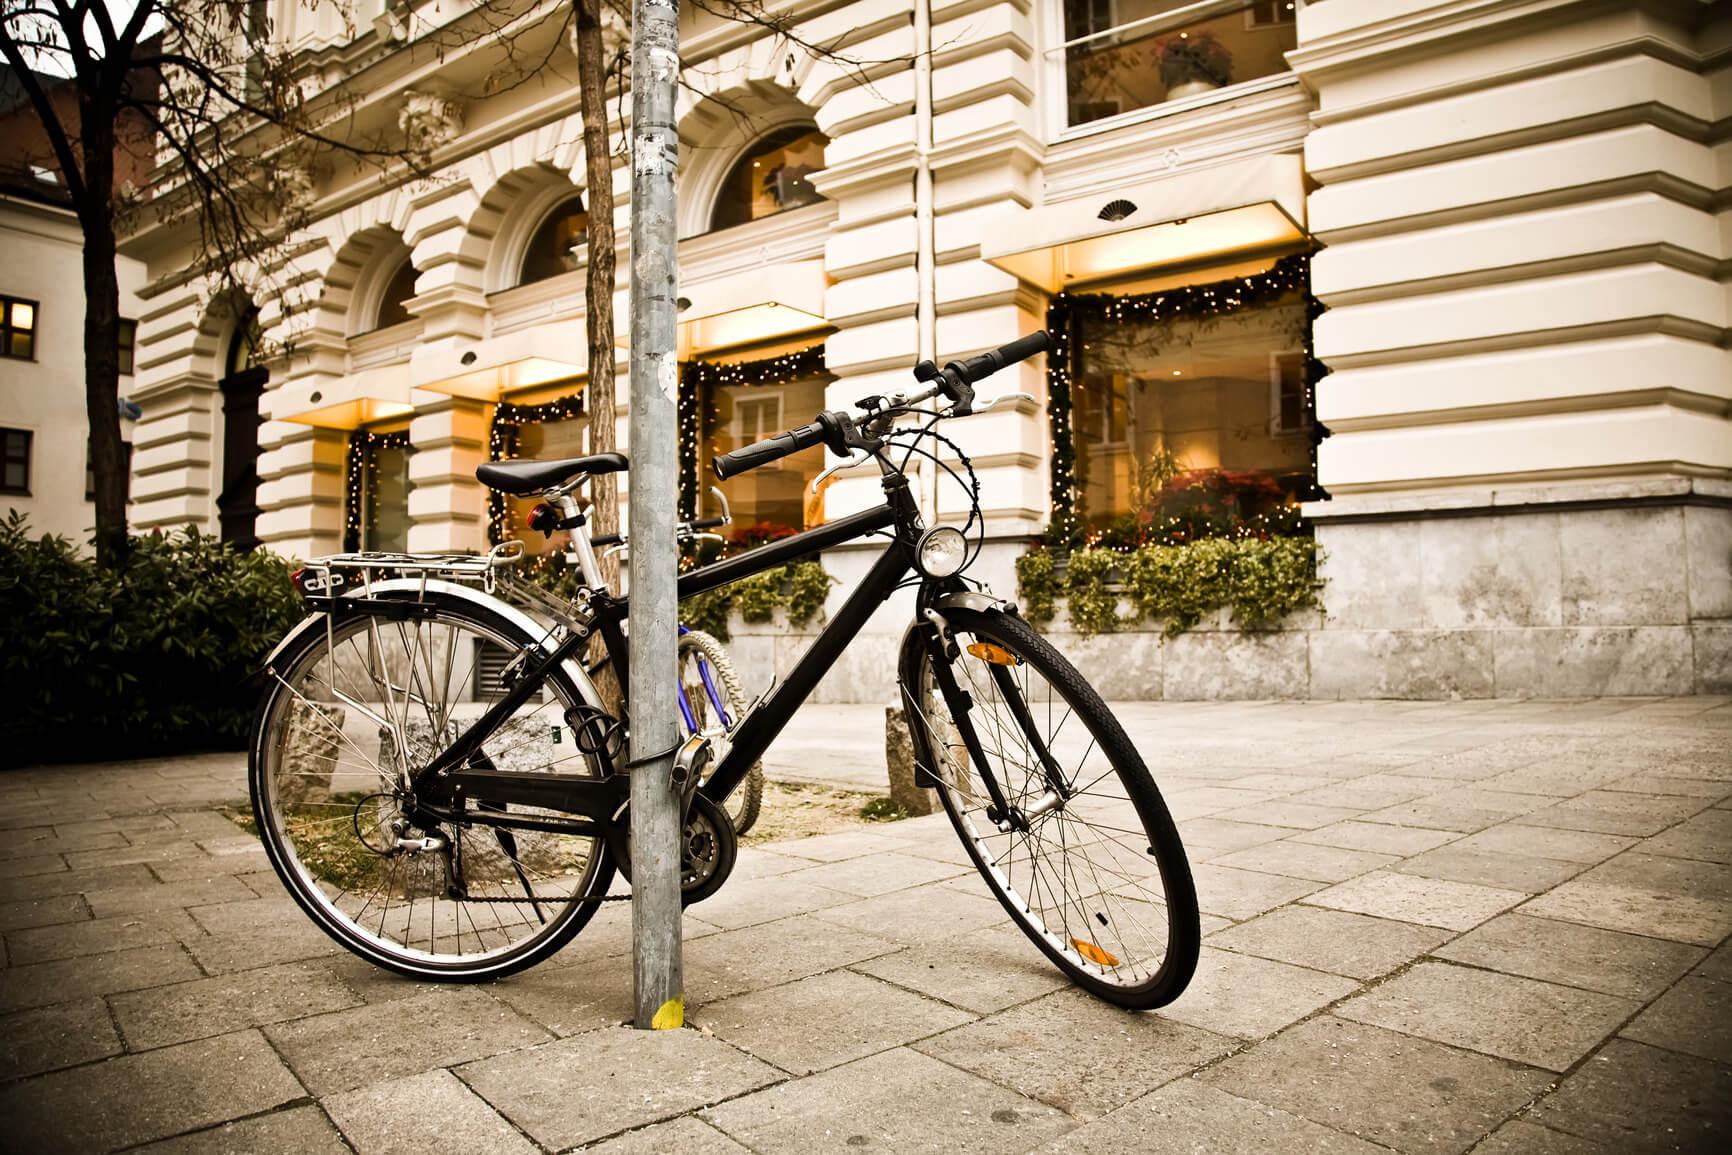 City Bike 8 Meine-Überdachung.de